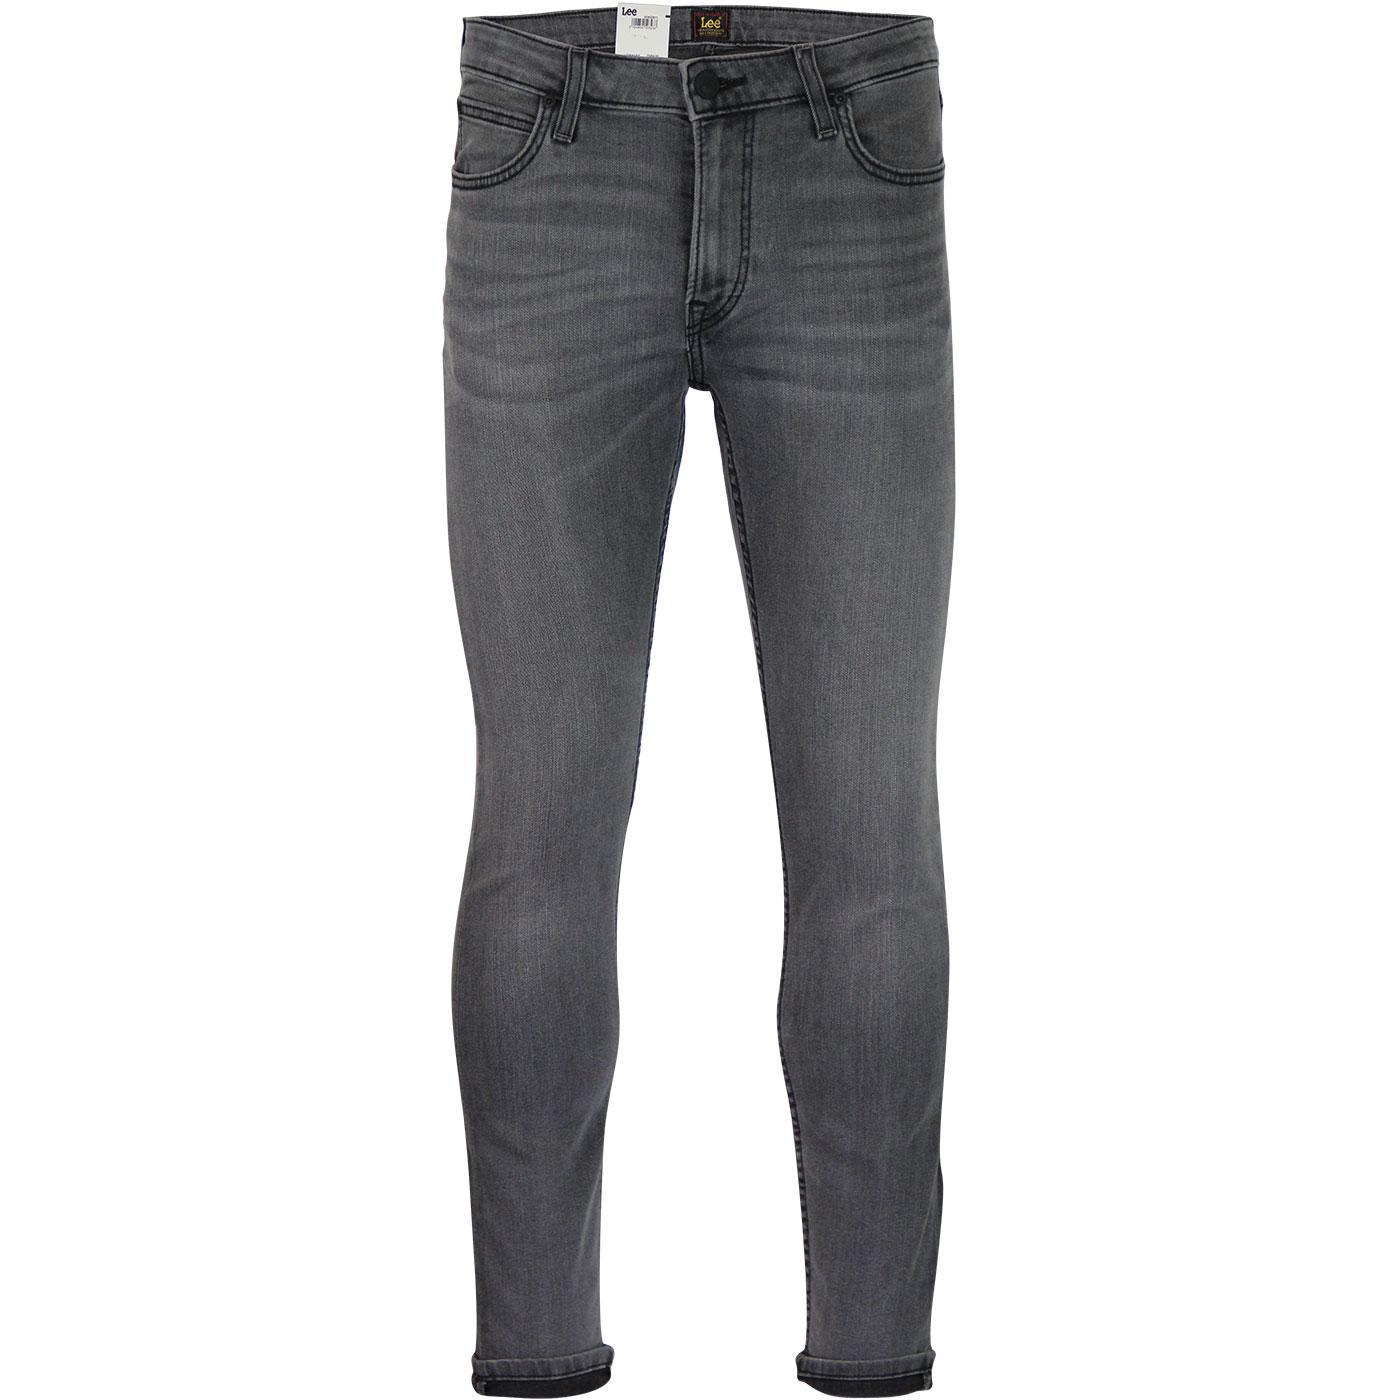 Malone LEE JEANS Retro Skinny Jeans NEW GREY